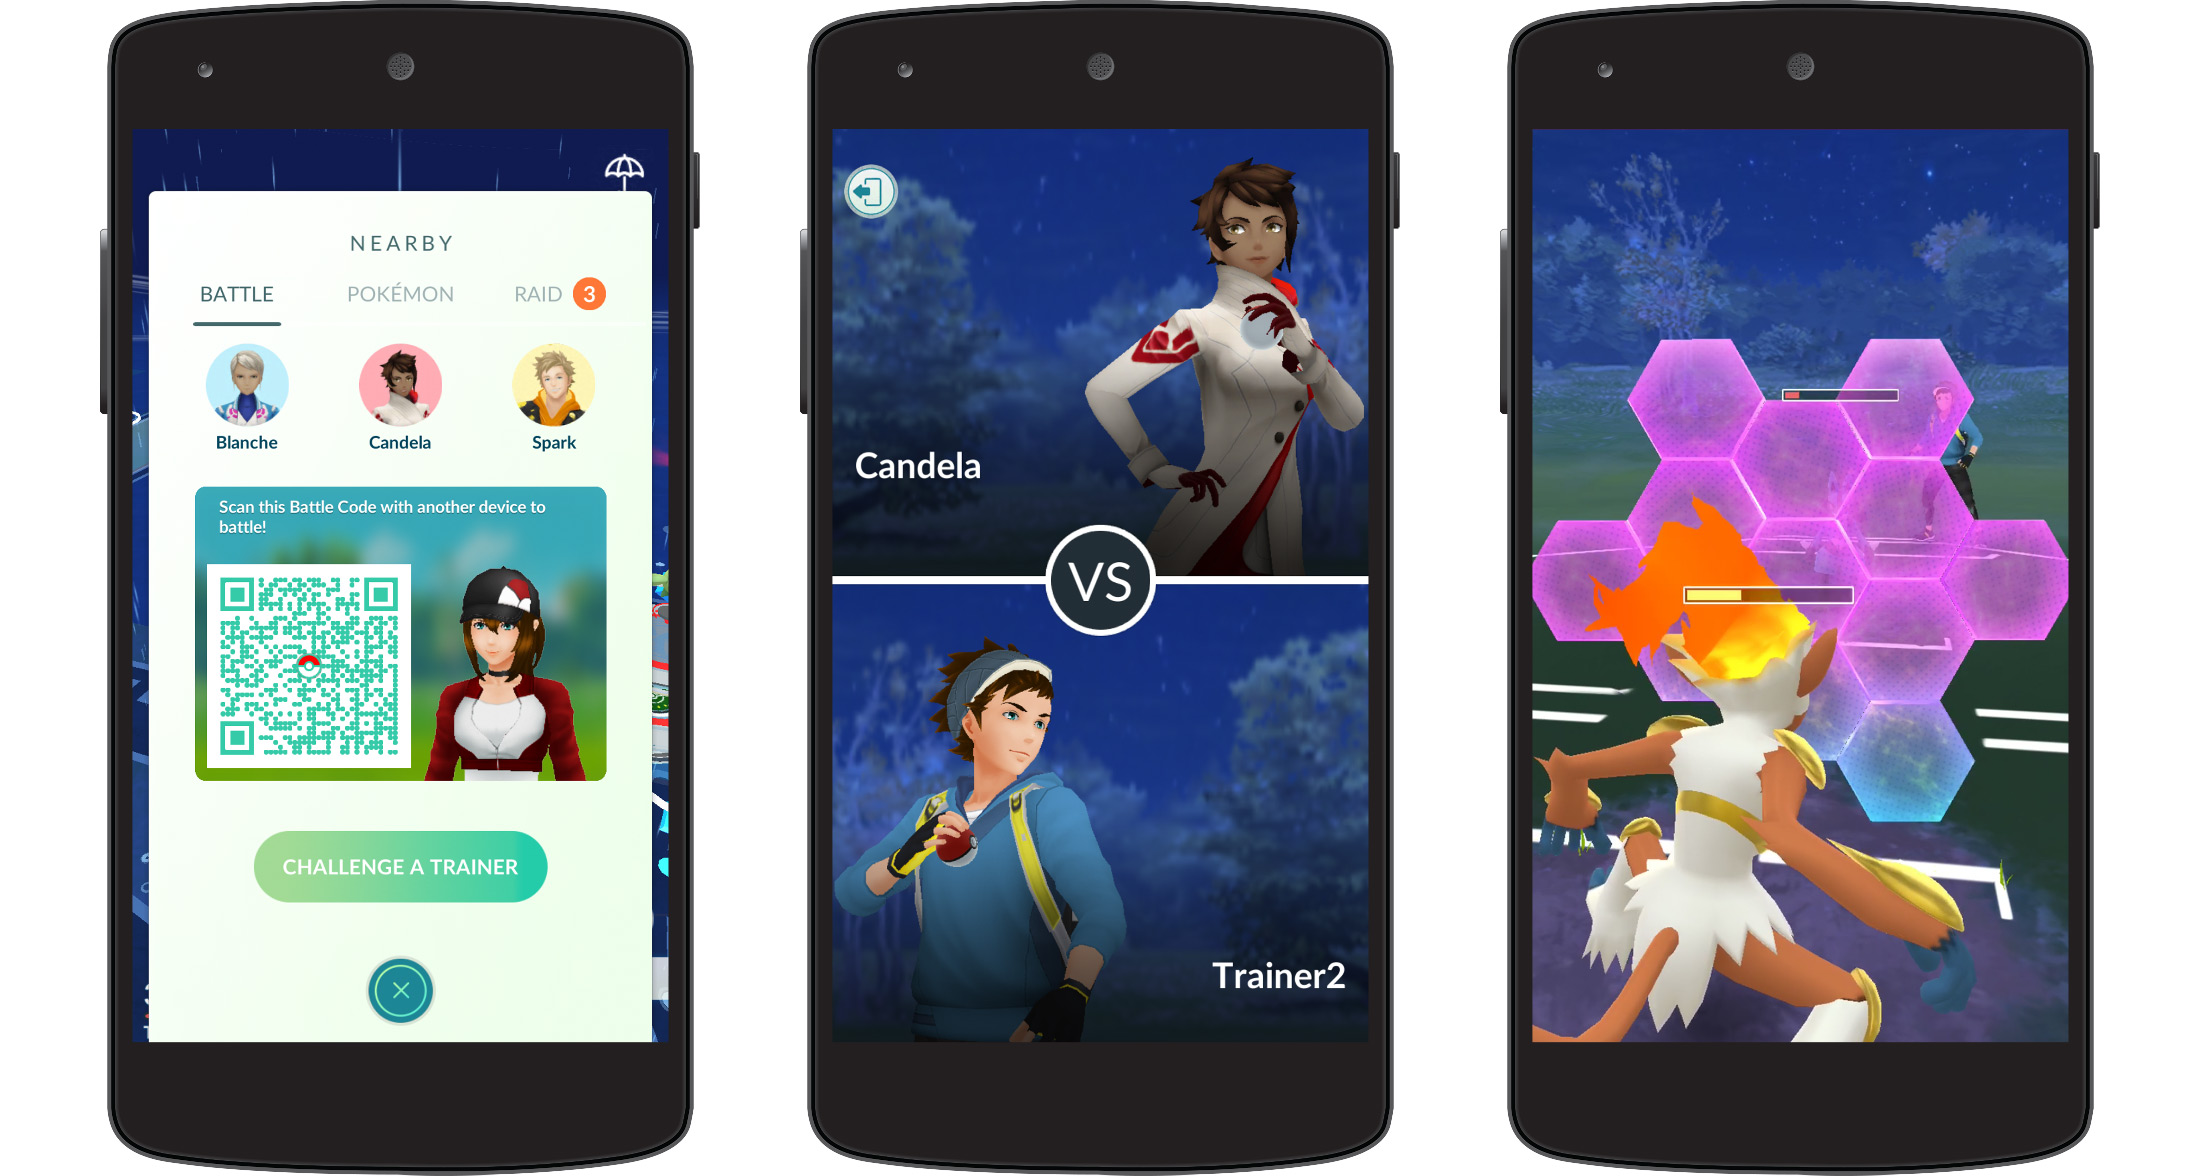 Here's how Trainer Battles work in Pokemon GO screenshot